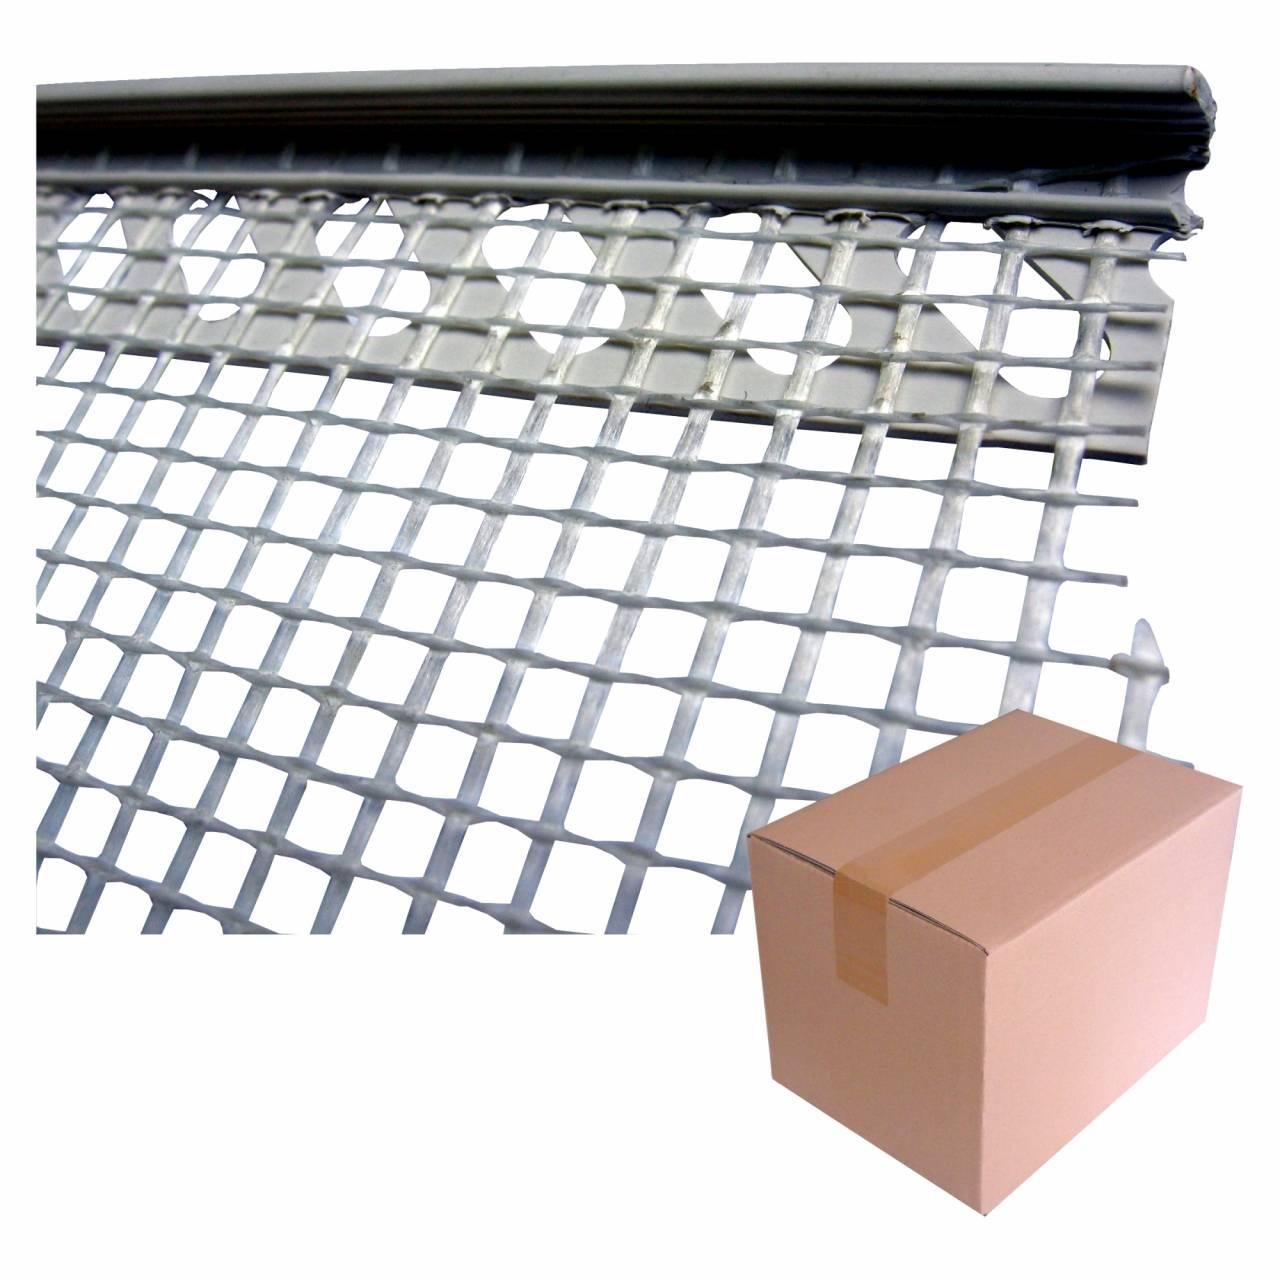 Putz-Abschlussprofil 6 mm / Krt a 50 Stäbe X 2,0 m